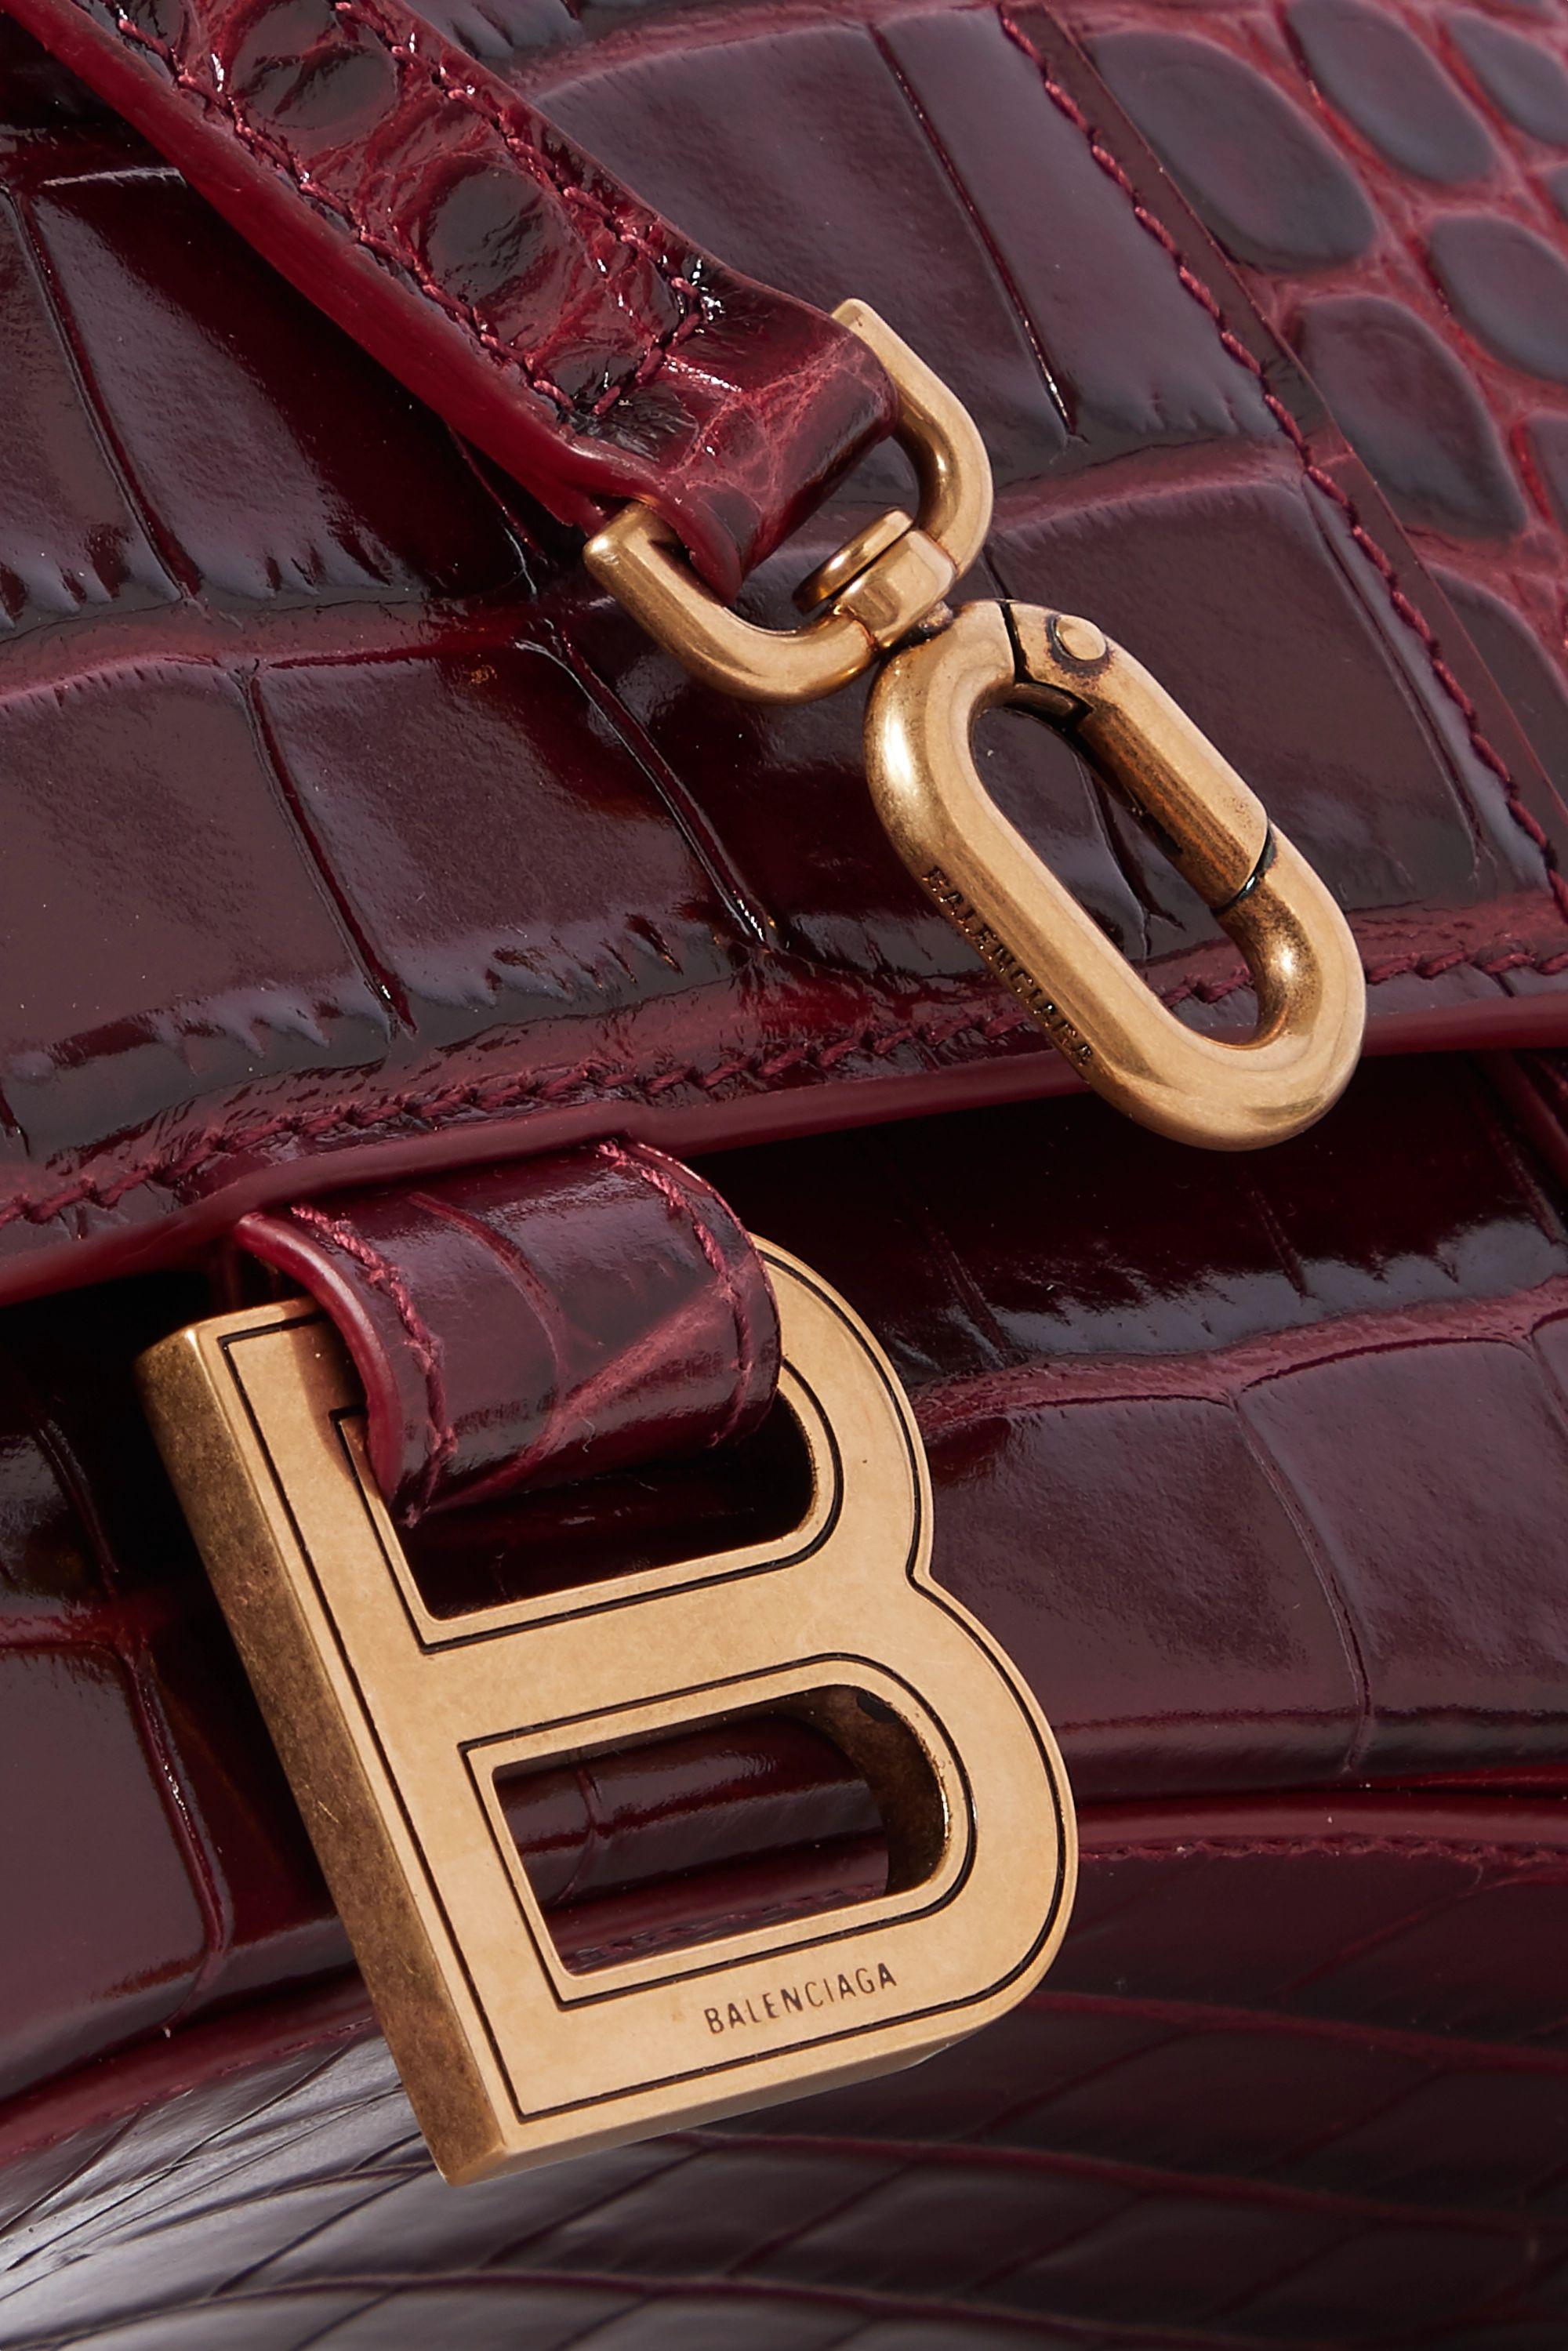 Burgundy Hourglass Croc-effect Leather Tote | Balenciaga